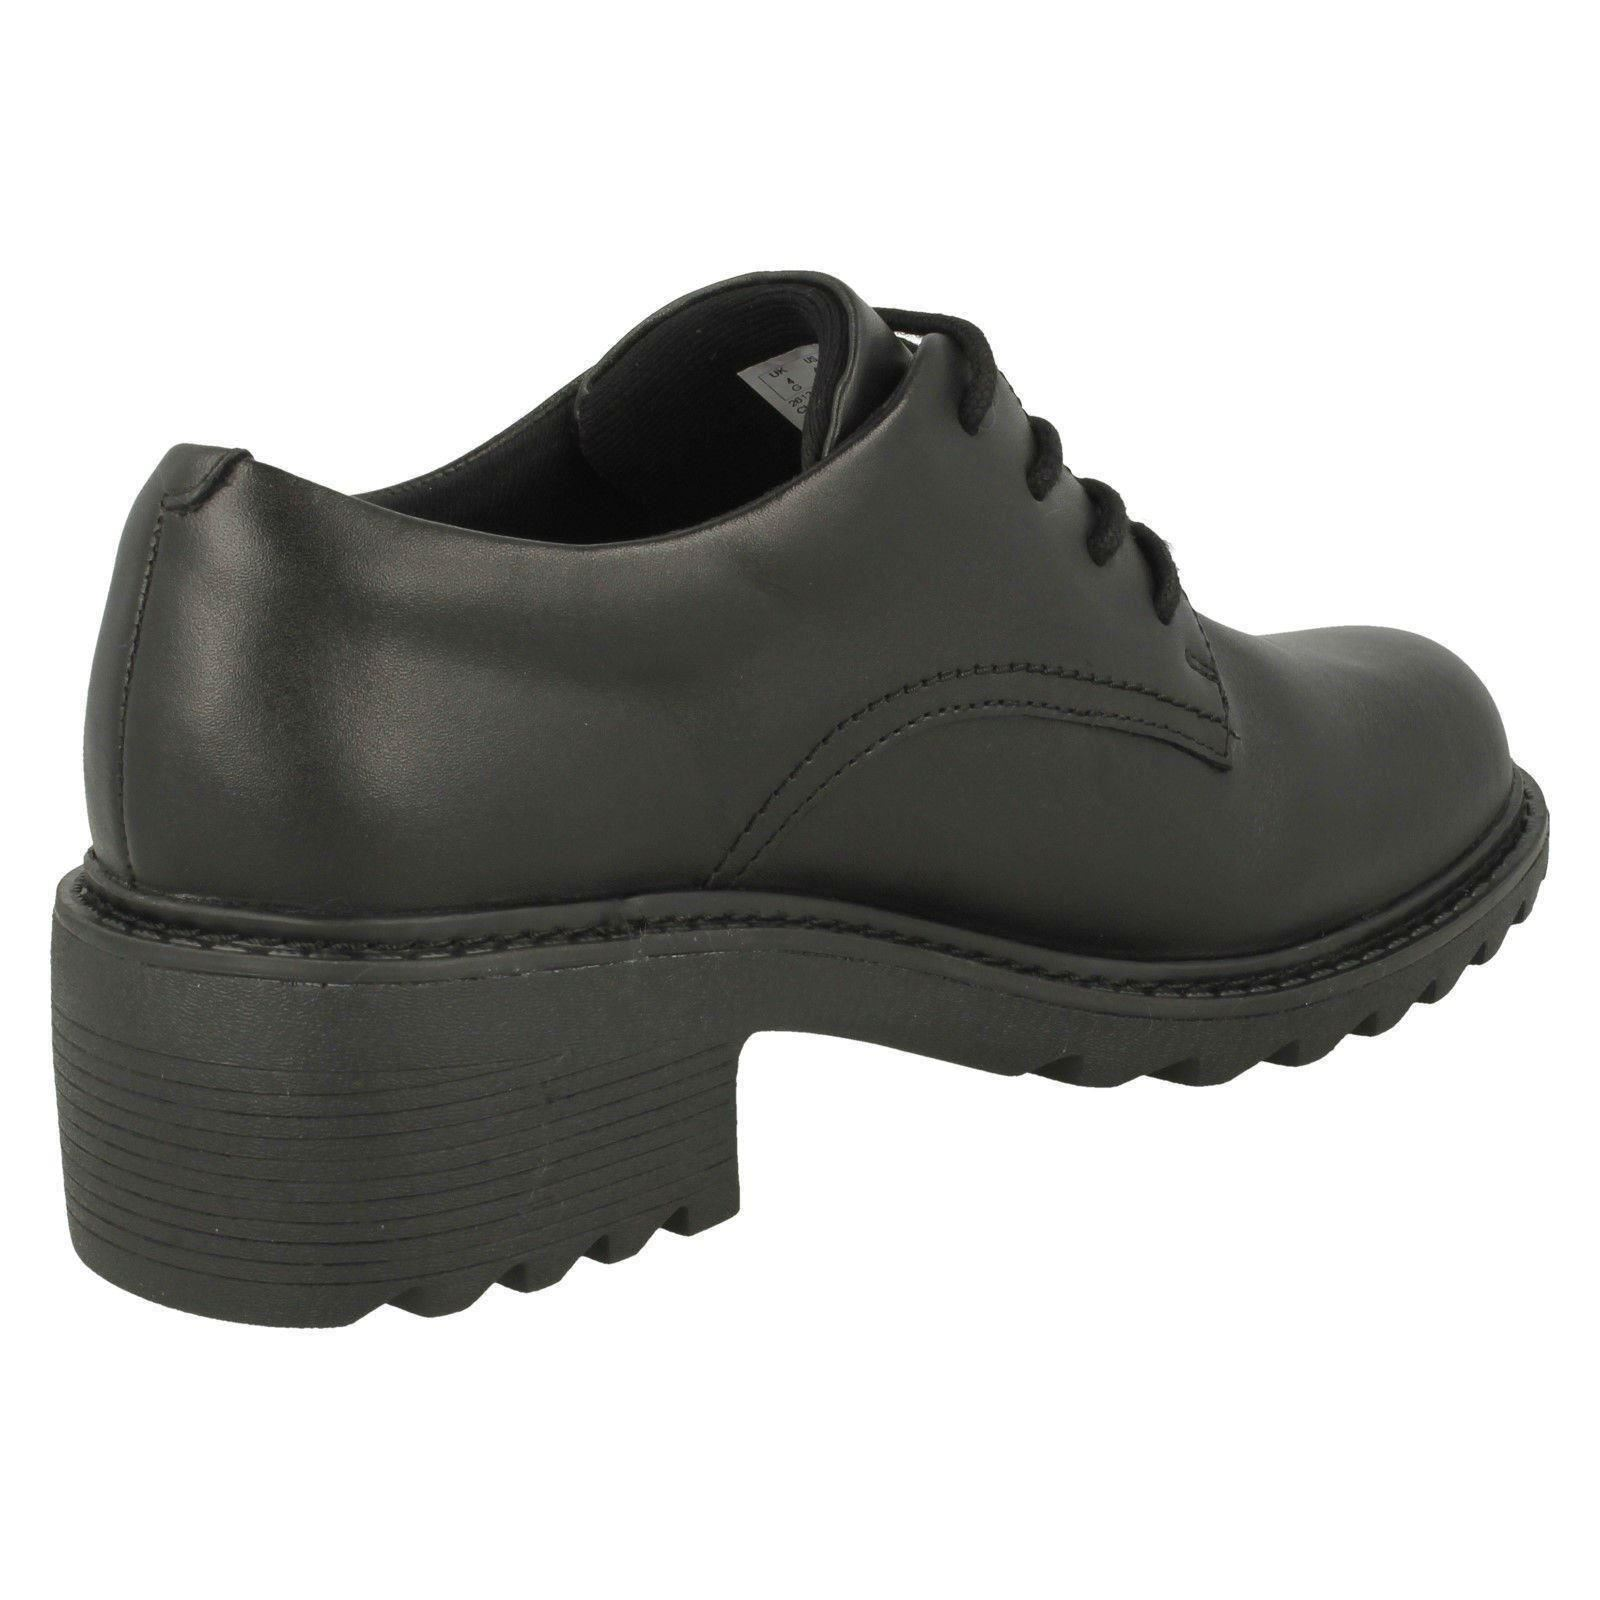 Girls Clarks Chunky Heeled School Shoes /'Frankie Grove/'